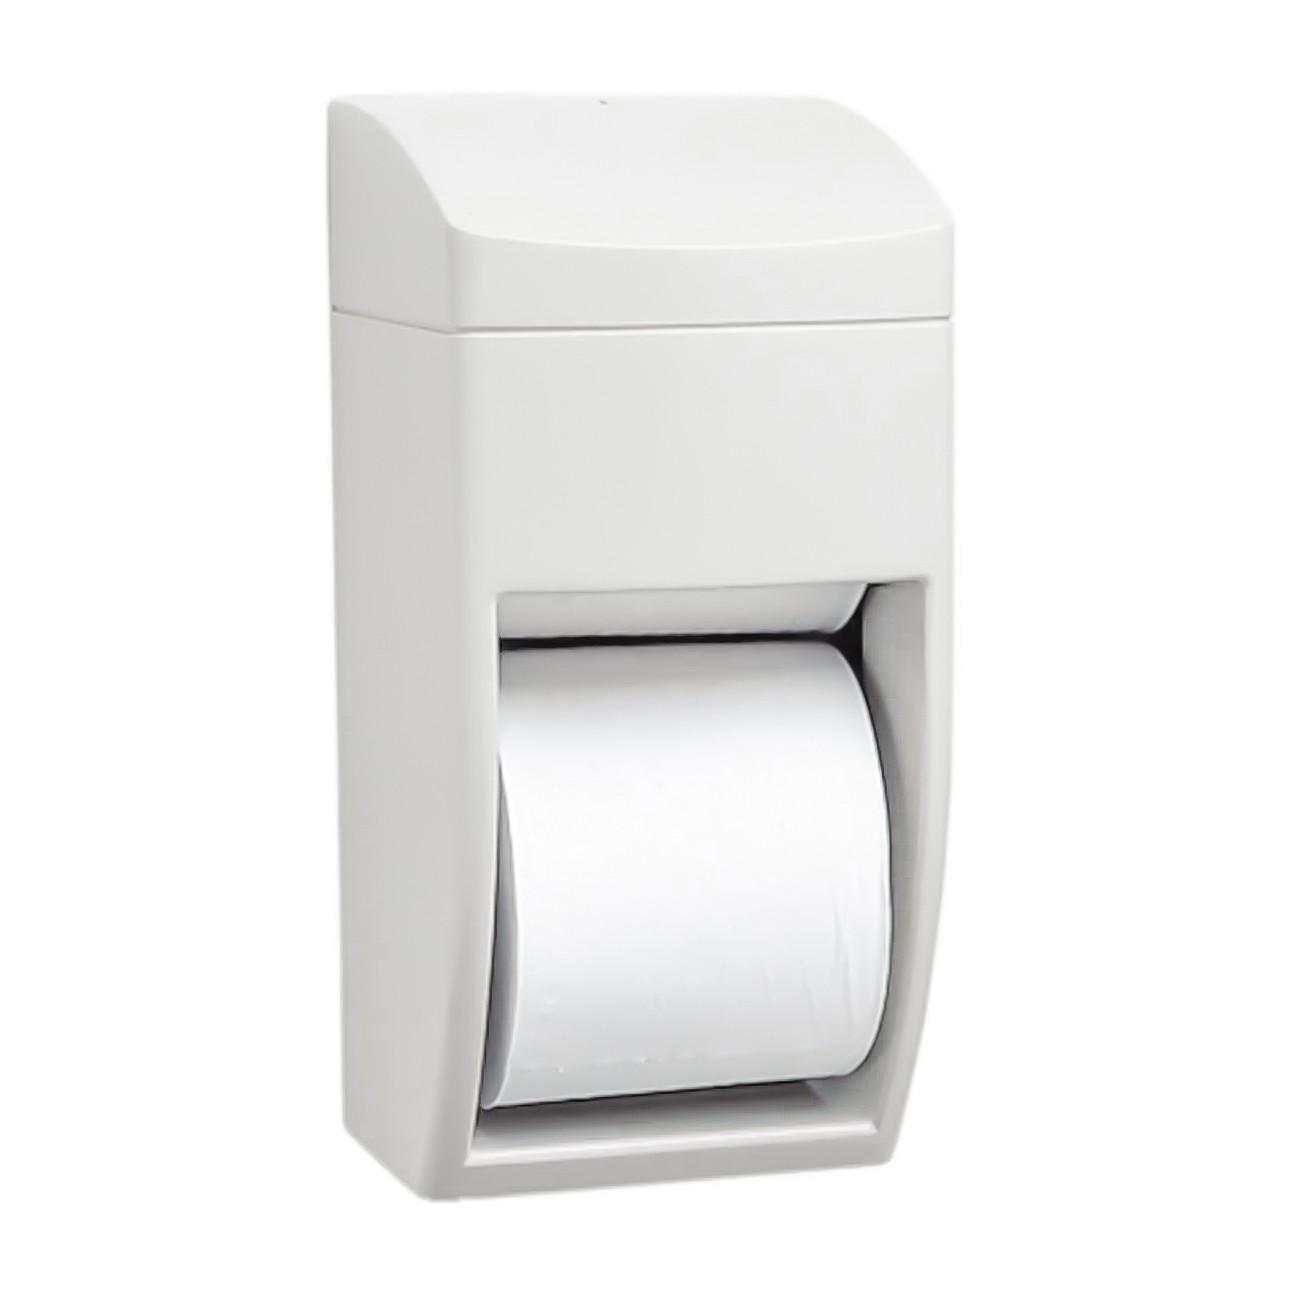 TOTALPACK® Double Bath Tissue Dispenser